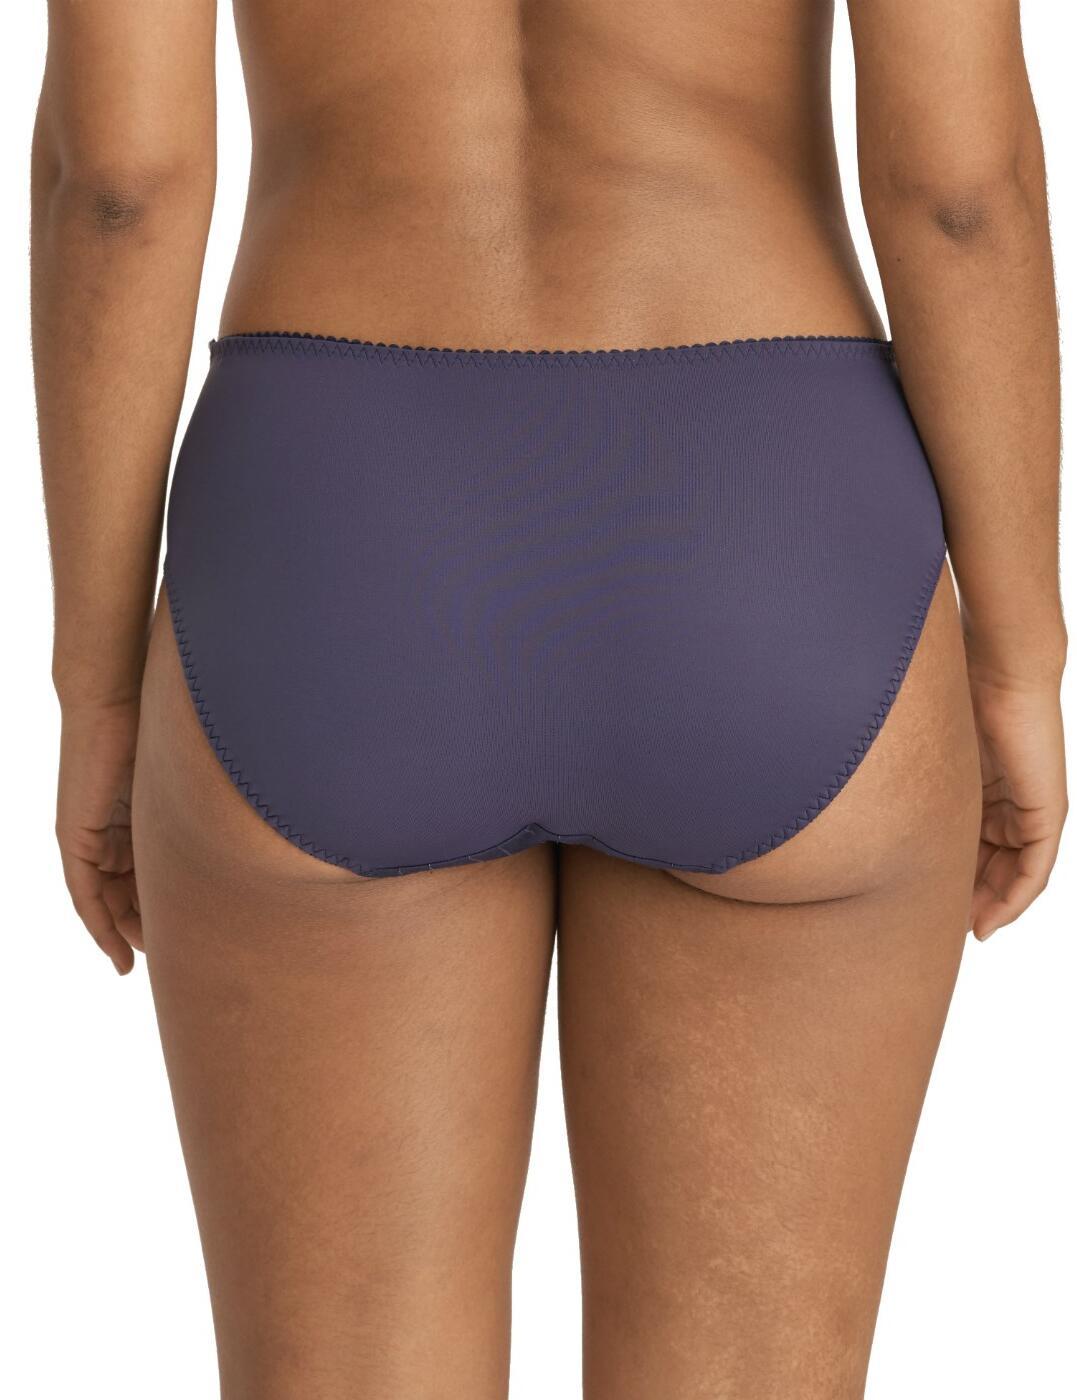 Prima-Donna-Deauville-Volle-Unterhose-Slip-Slips-Pant-0561811-Luxus-Dessous Indexbild 38